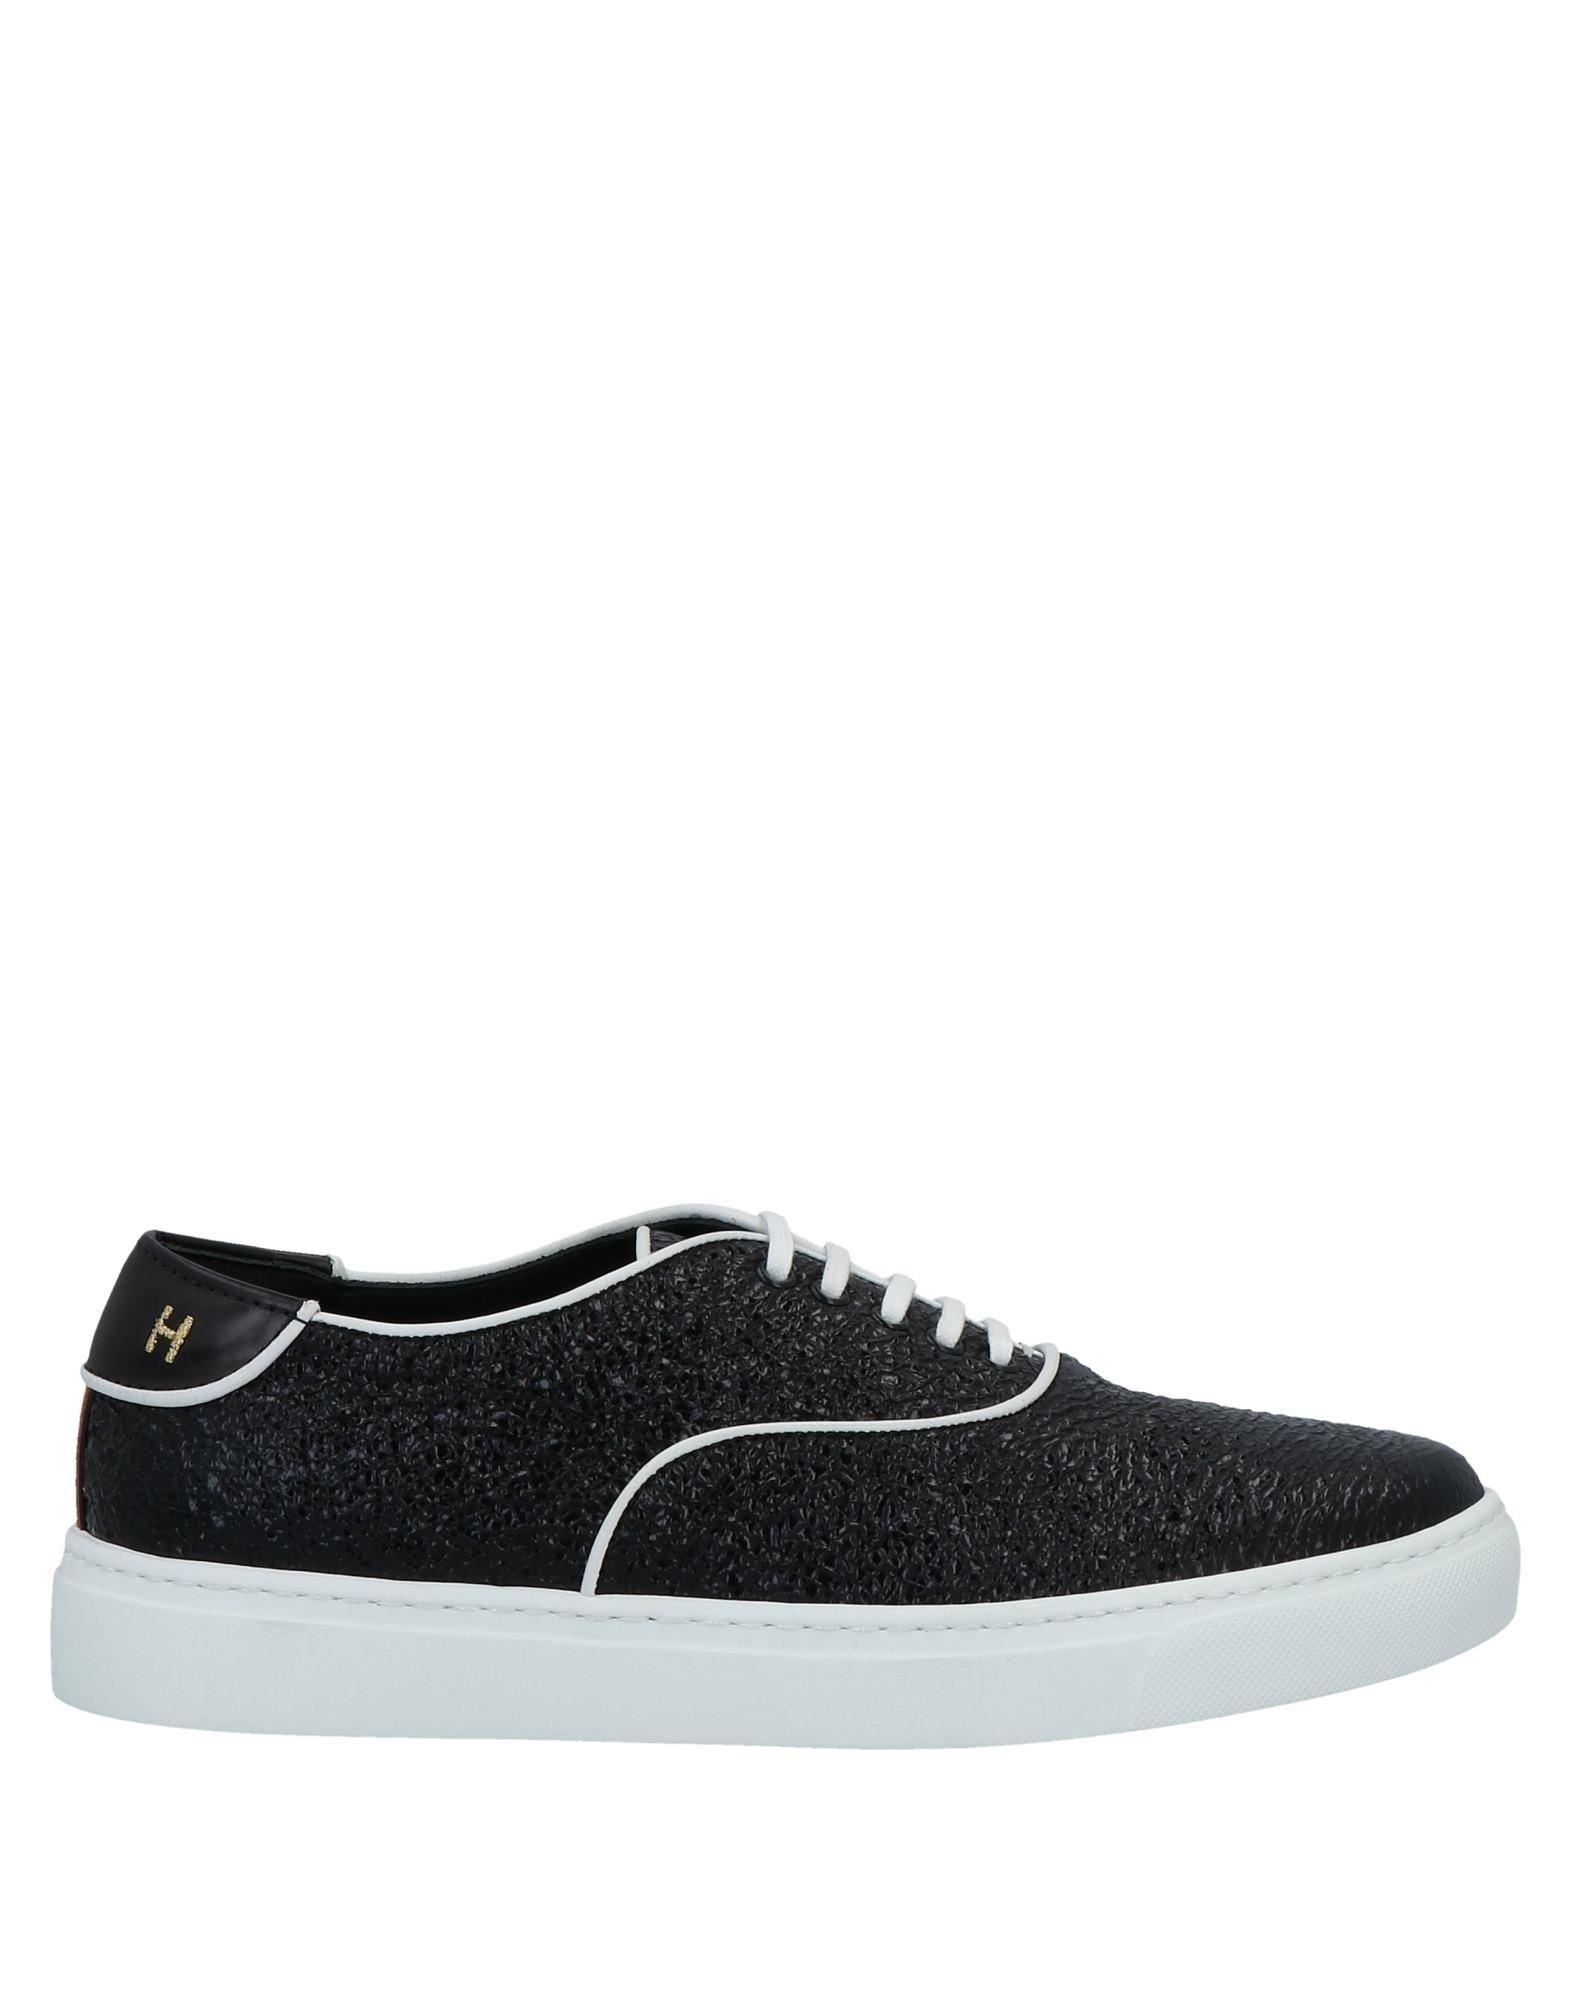 Henderson Baracco Sneakers In Black